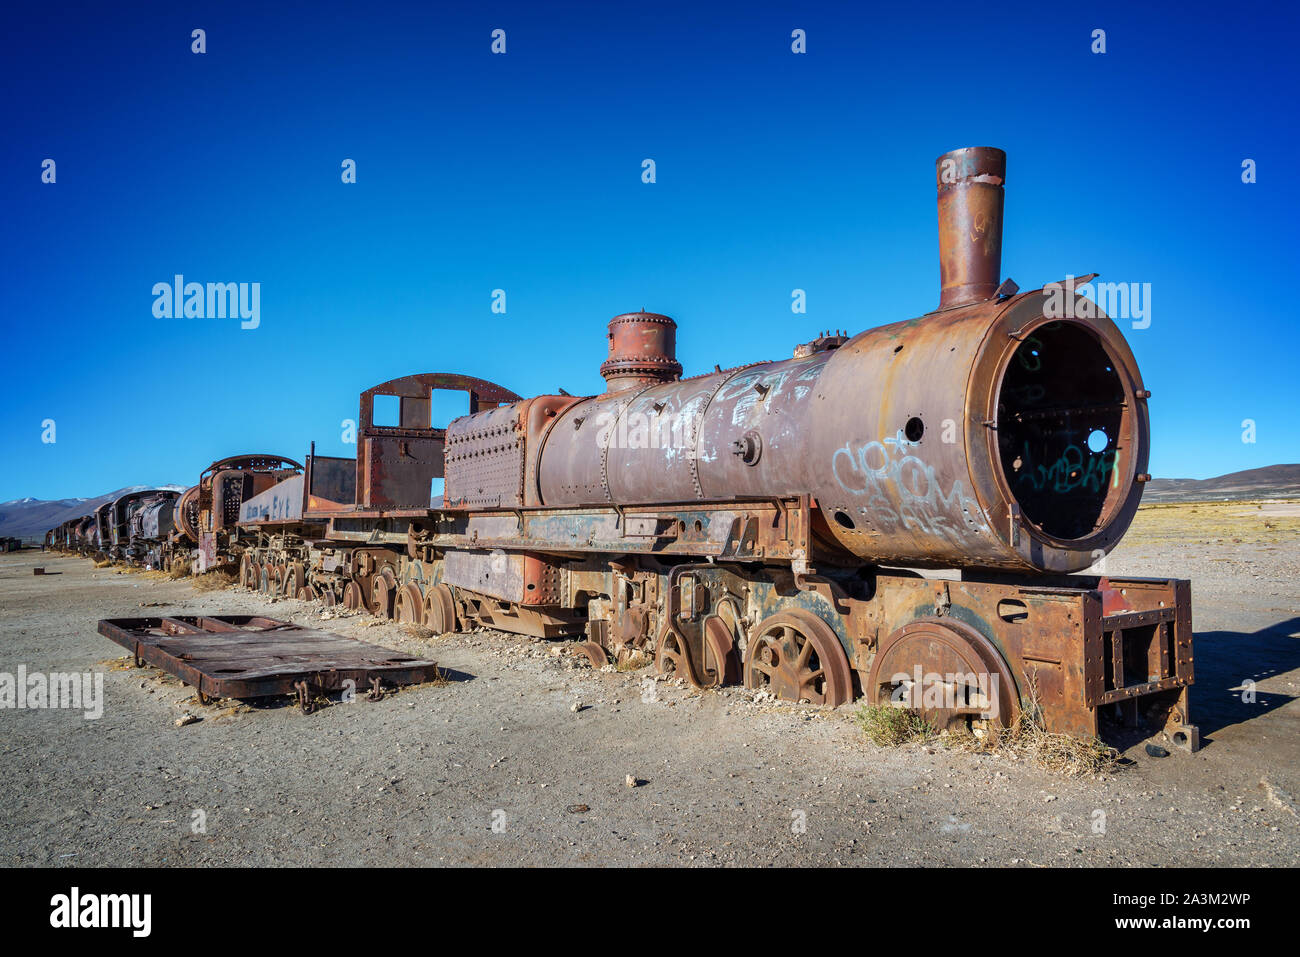 Old rusty locomotive abandoned in the train cemetery of Uyuni, Bolivia Stock Photo